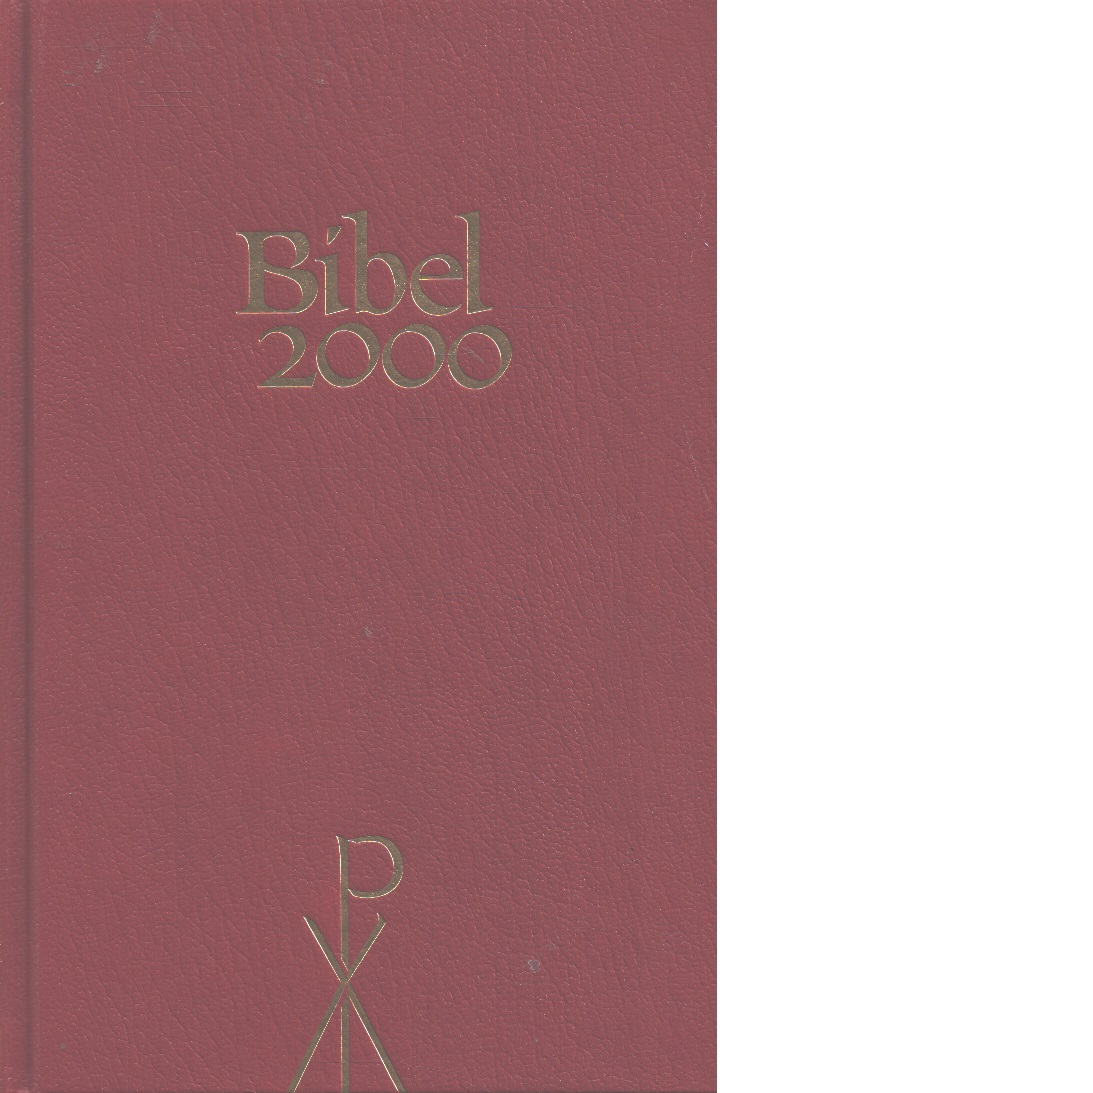 Bibel 2000 - Red.